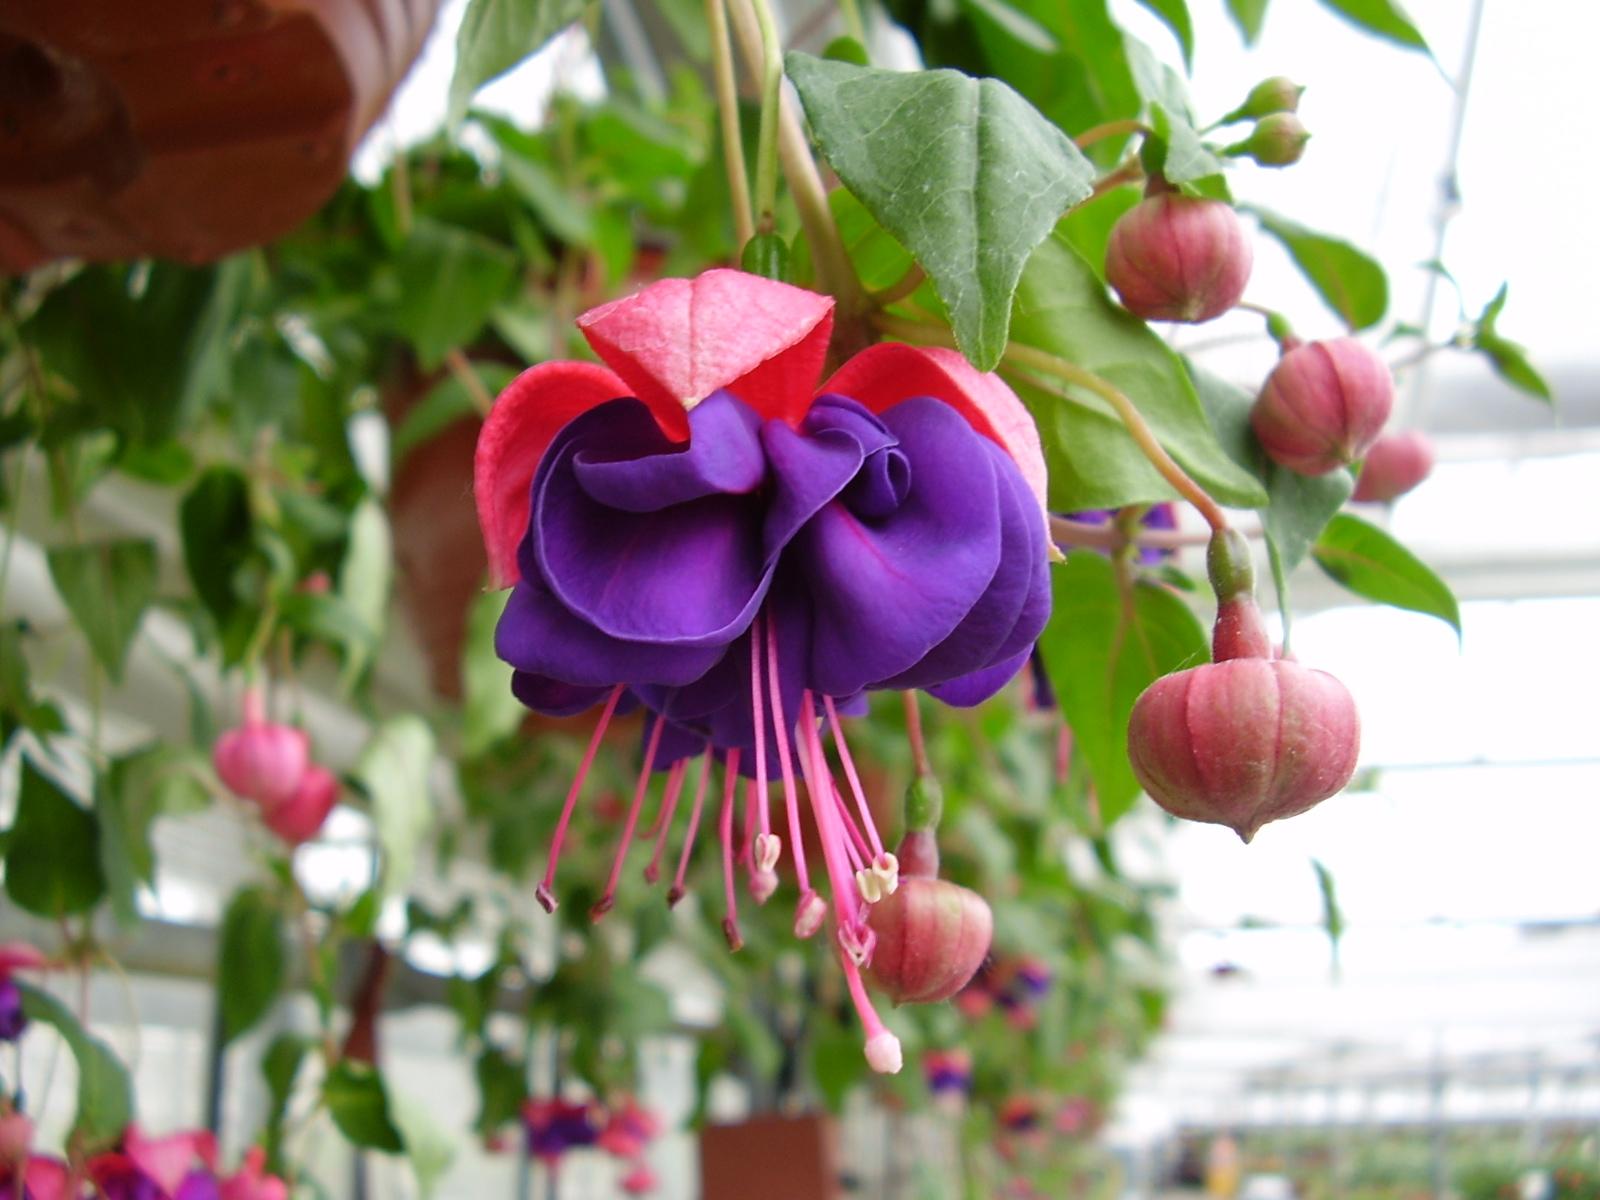 Цветы срезка каталог с фотографиями и названиями